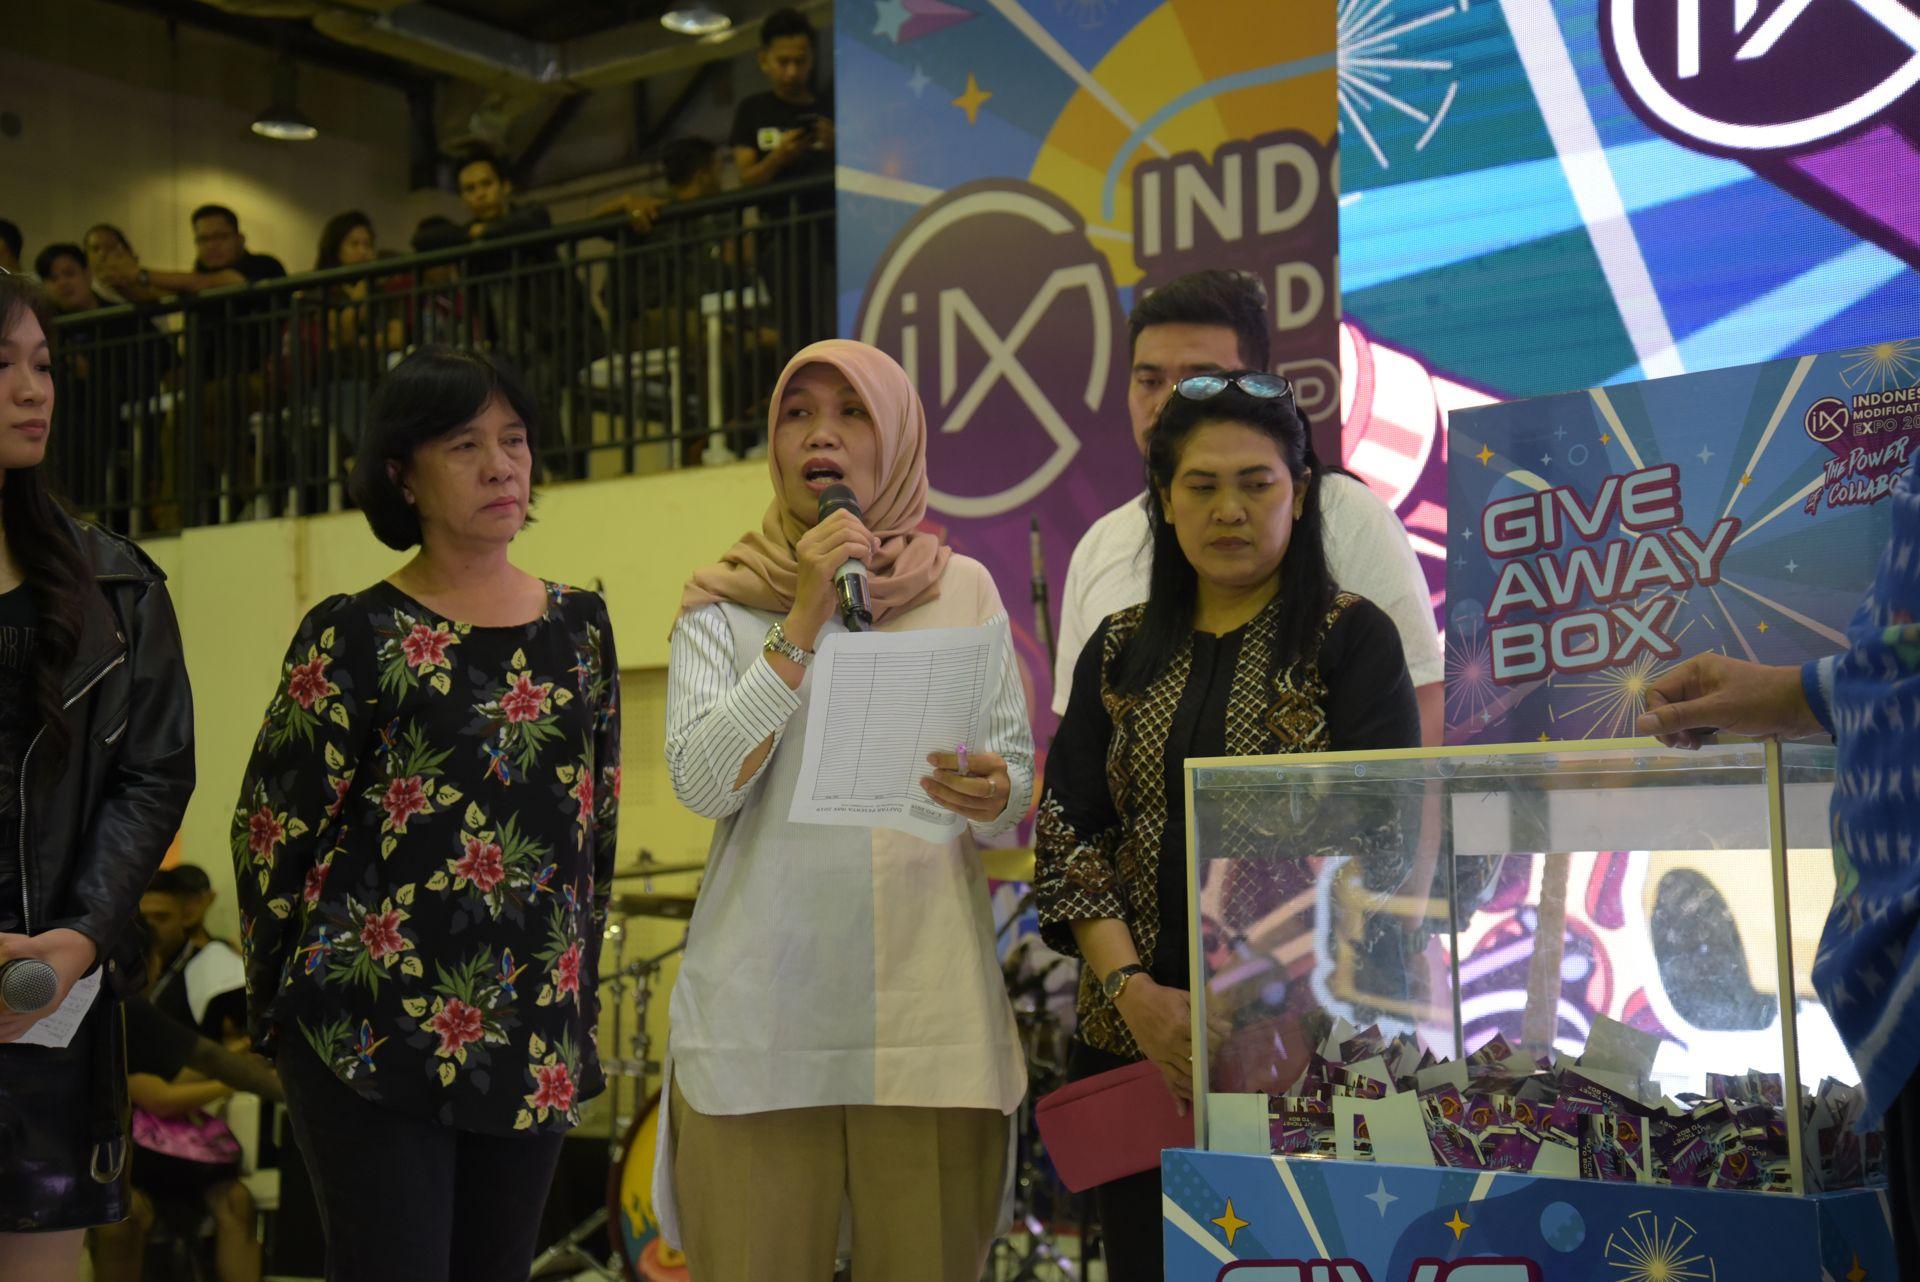 Imx giveaway (23)